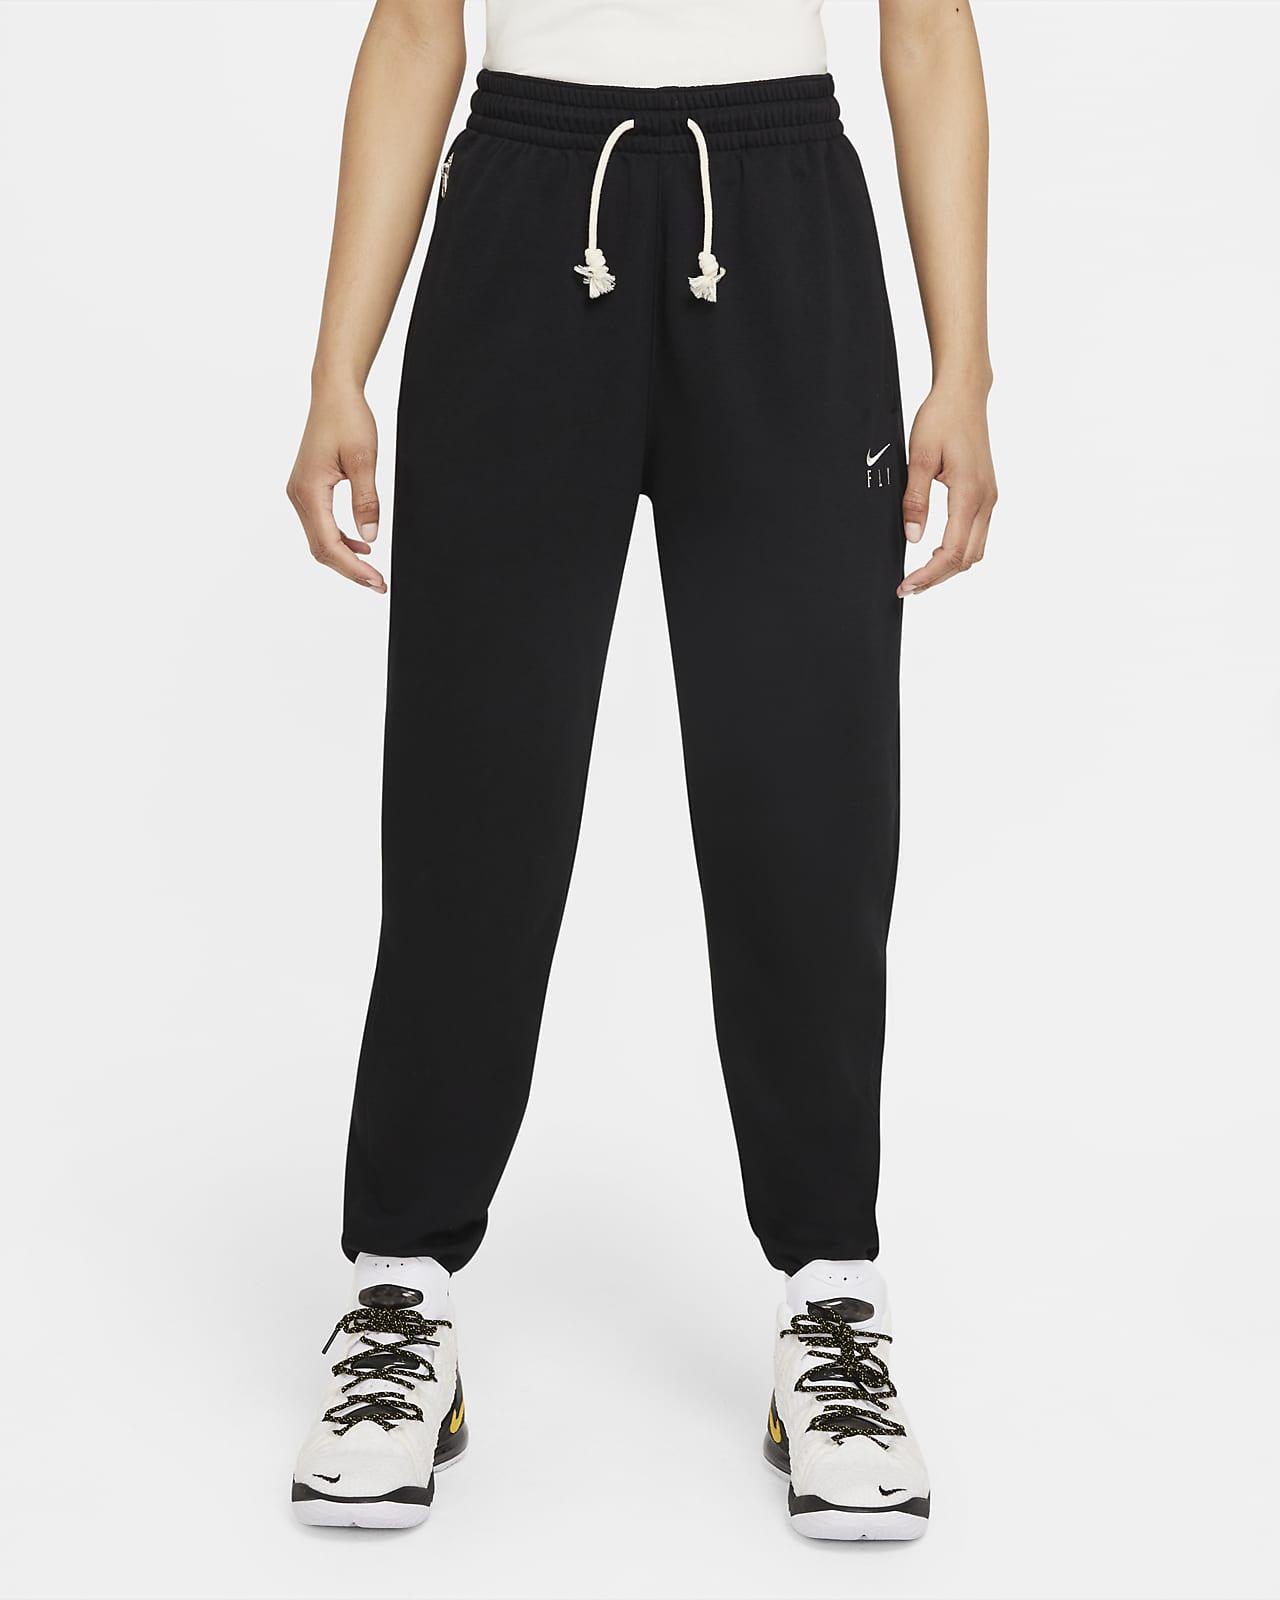 Nike Dri-FIT Swoosh Fly Standard Issue Women's Basketball Trousers